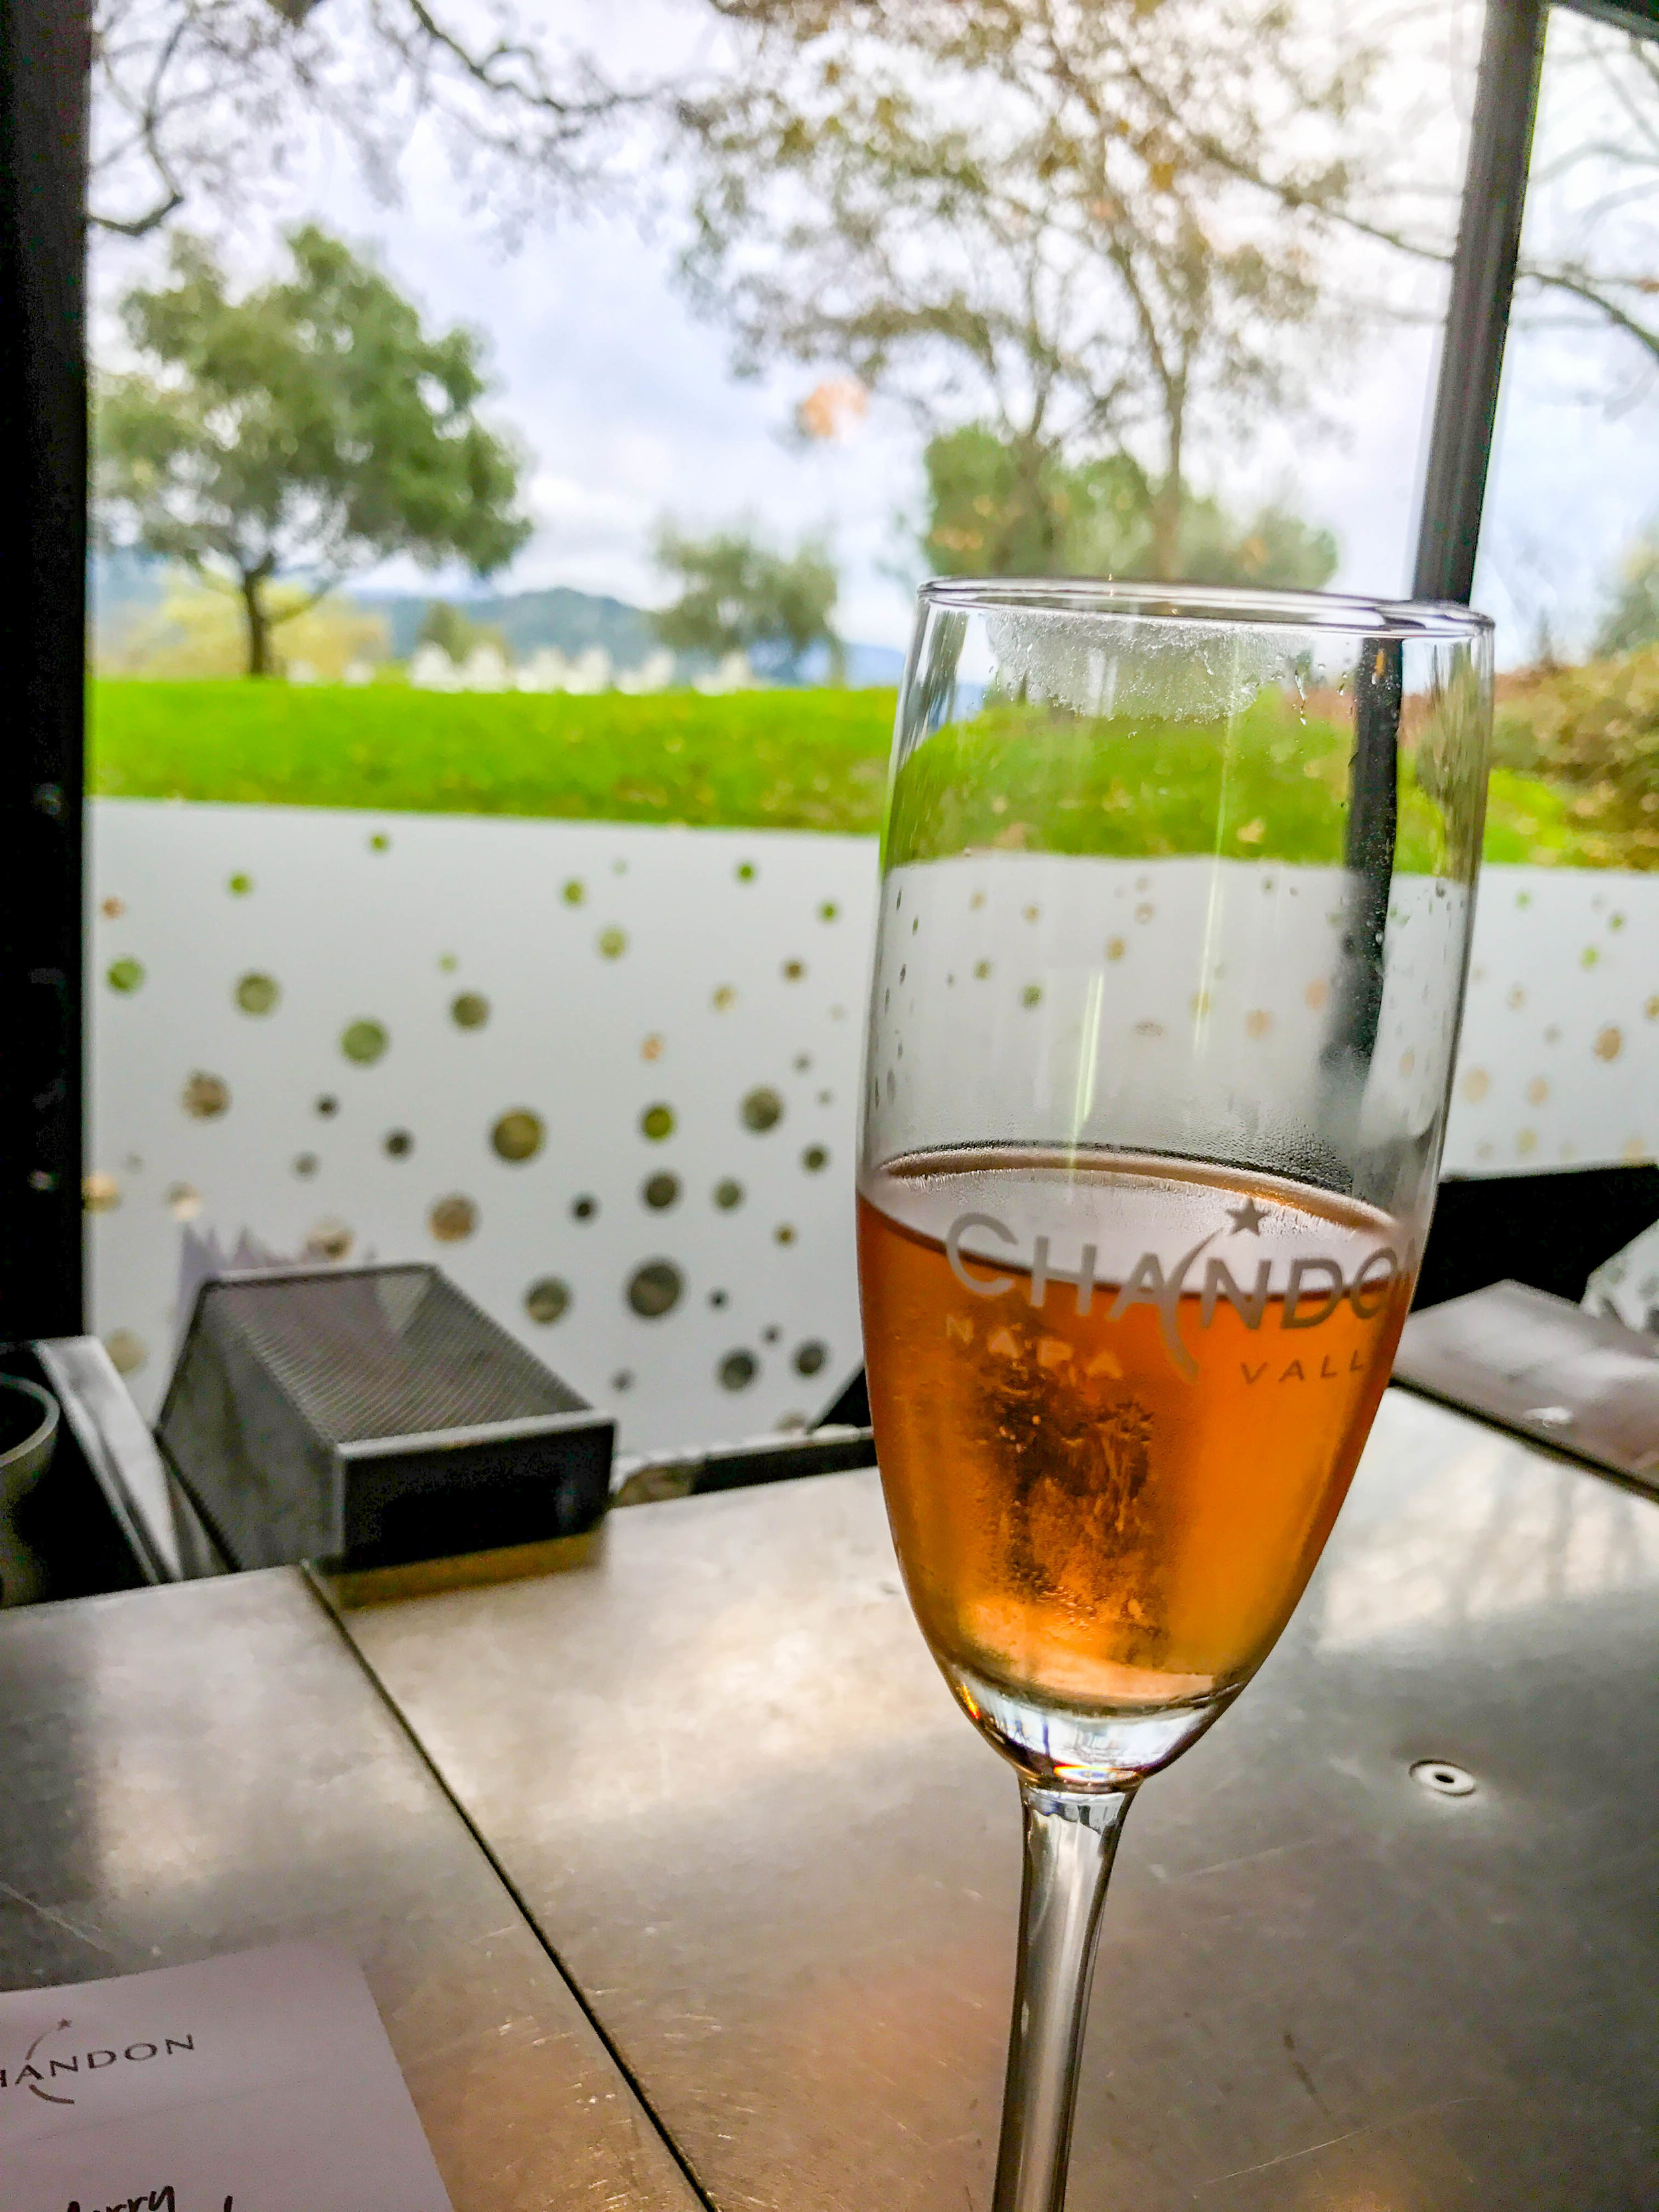 Chandon champagne winery Napa